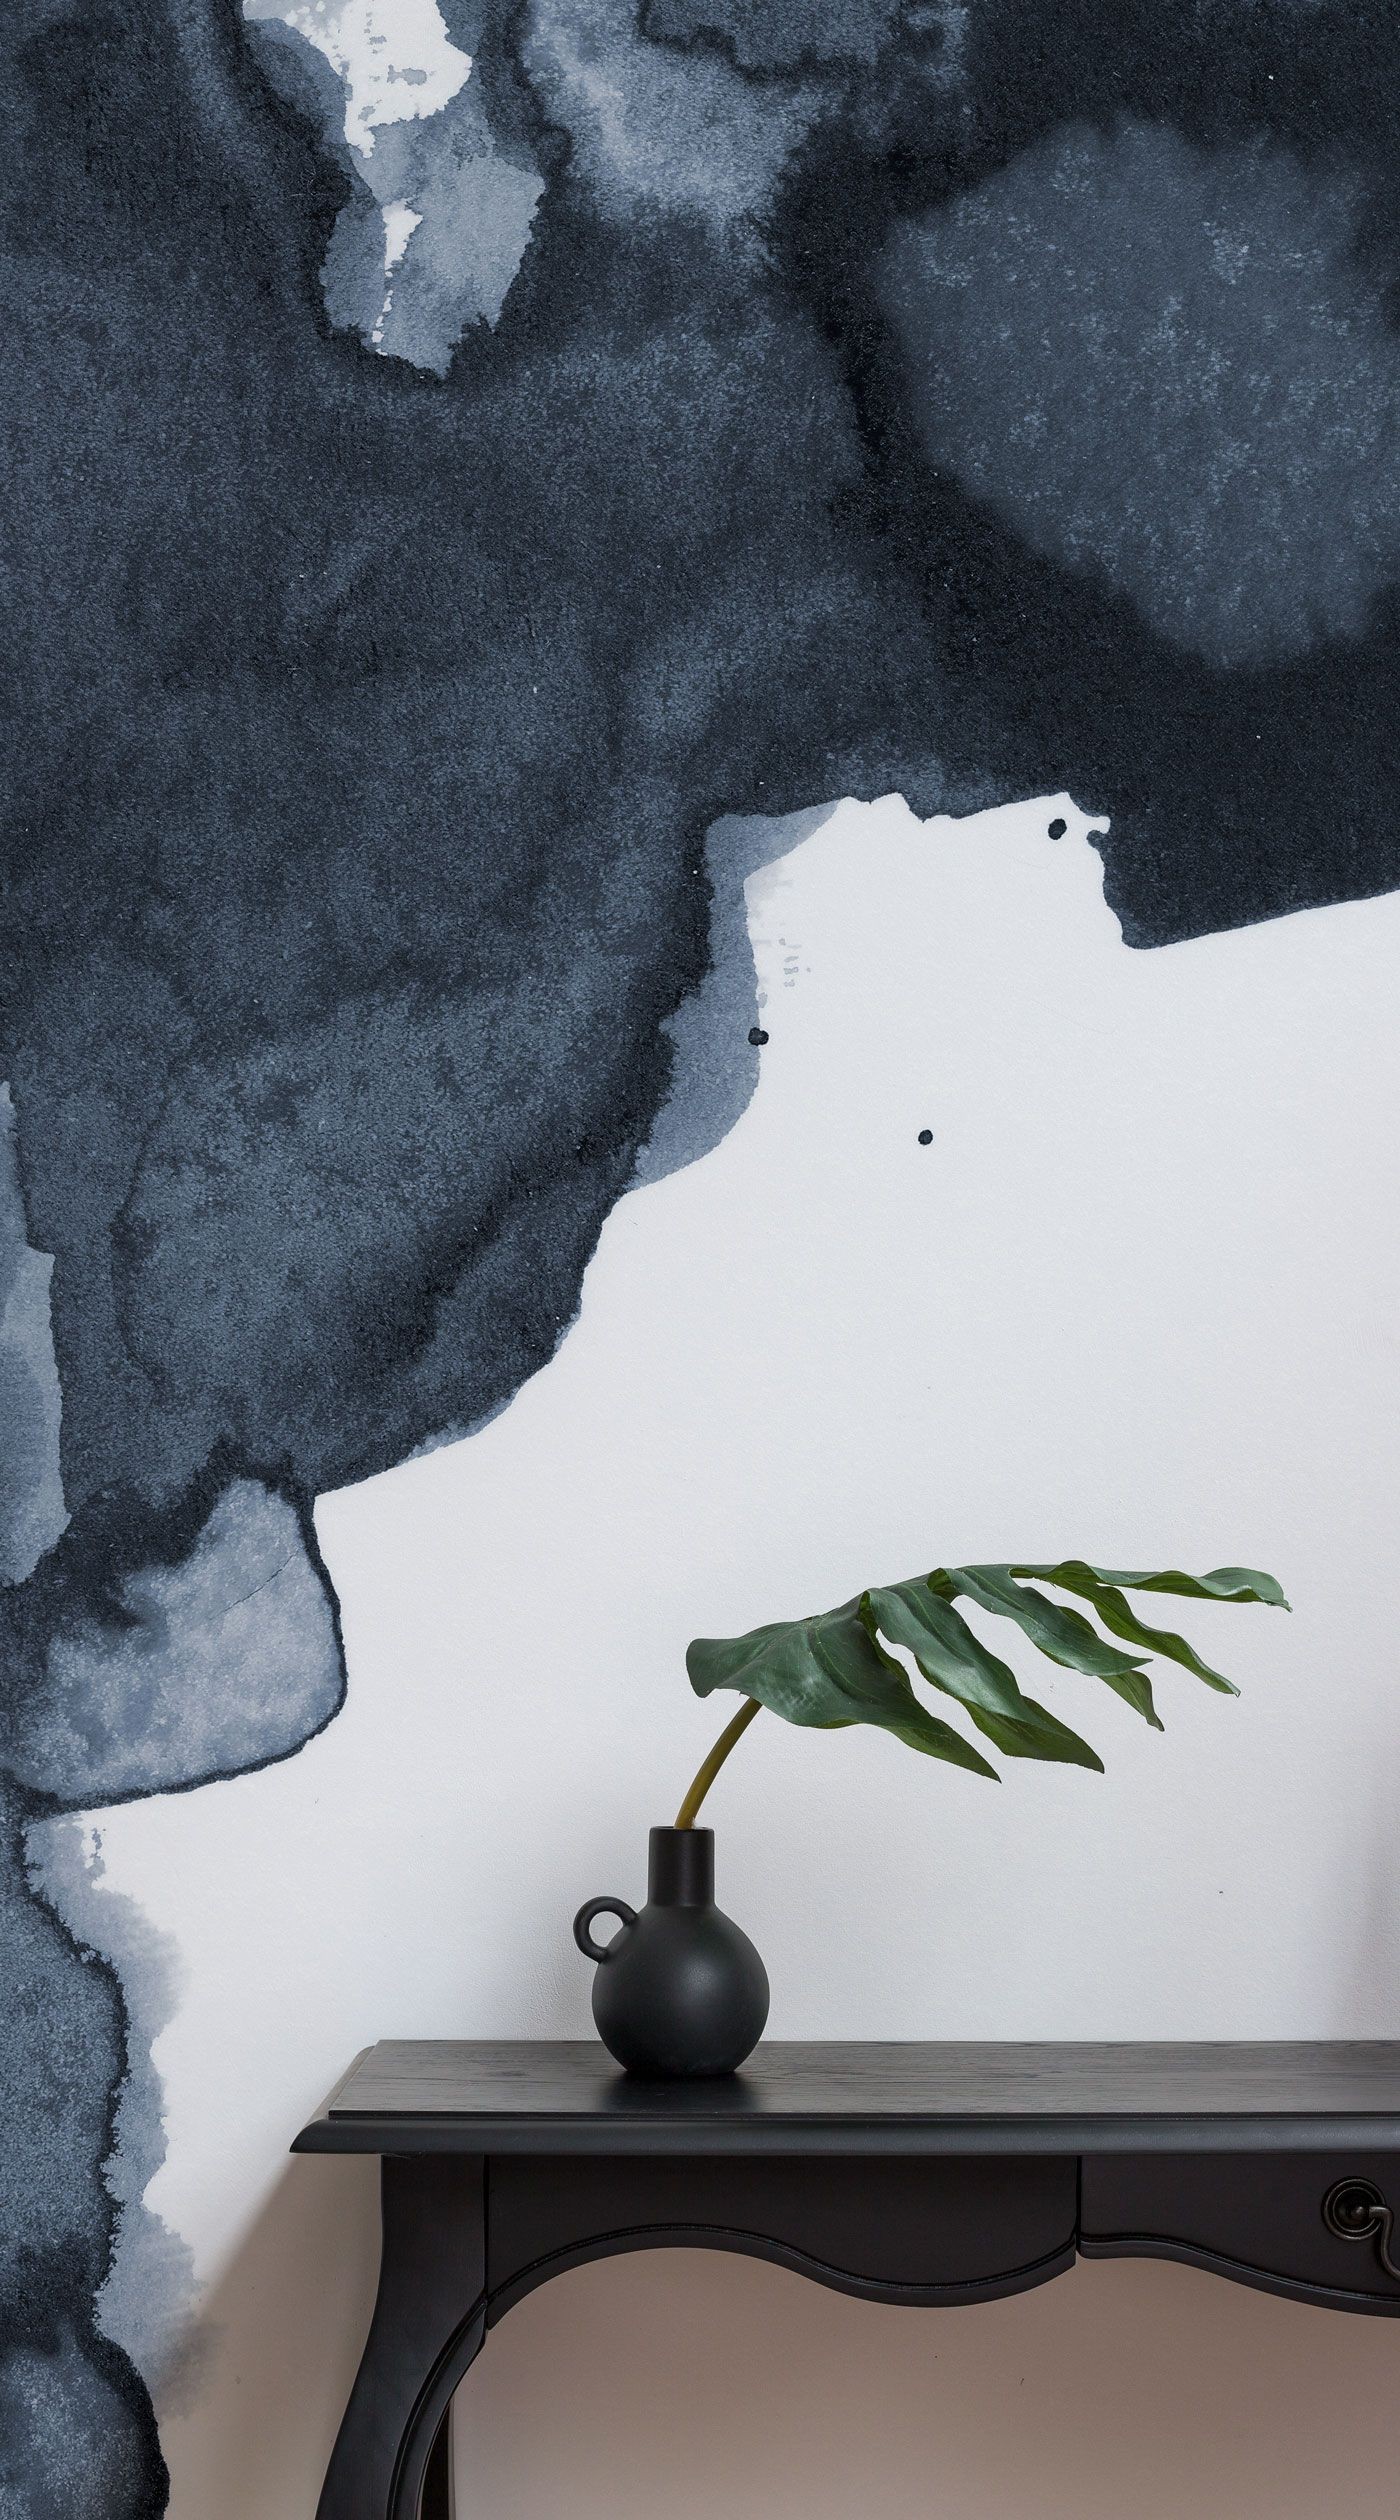 Navy hallway ideas  Navy Watercolor Wallpaper  Blue Smoke Design  MuralsWallpaper